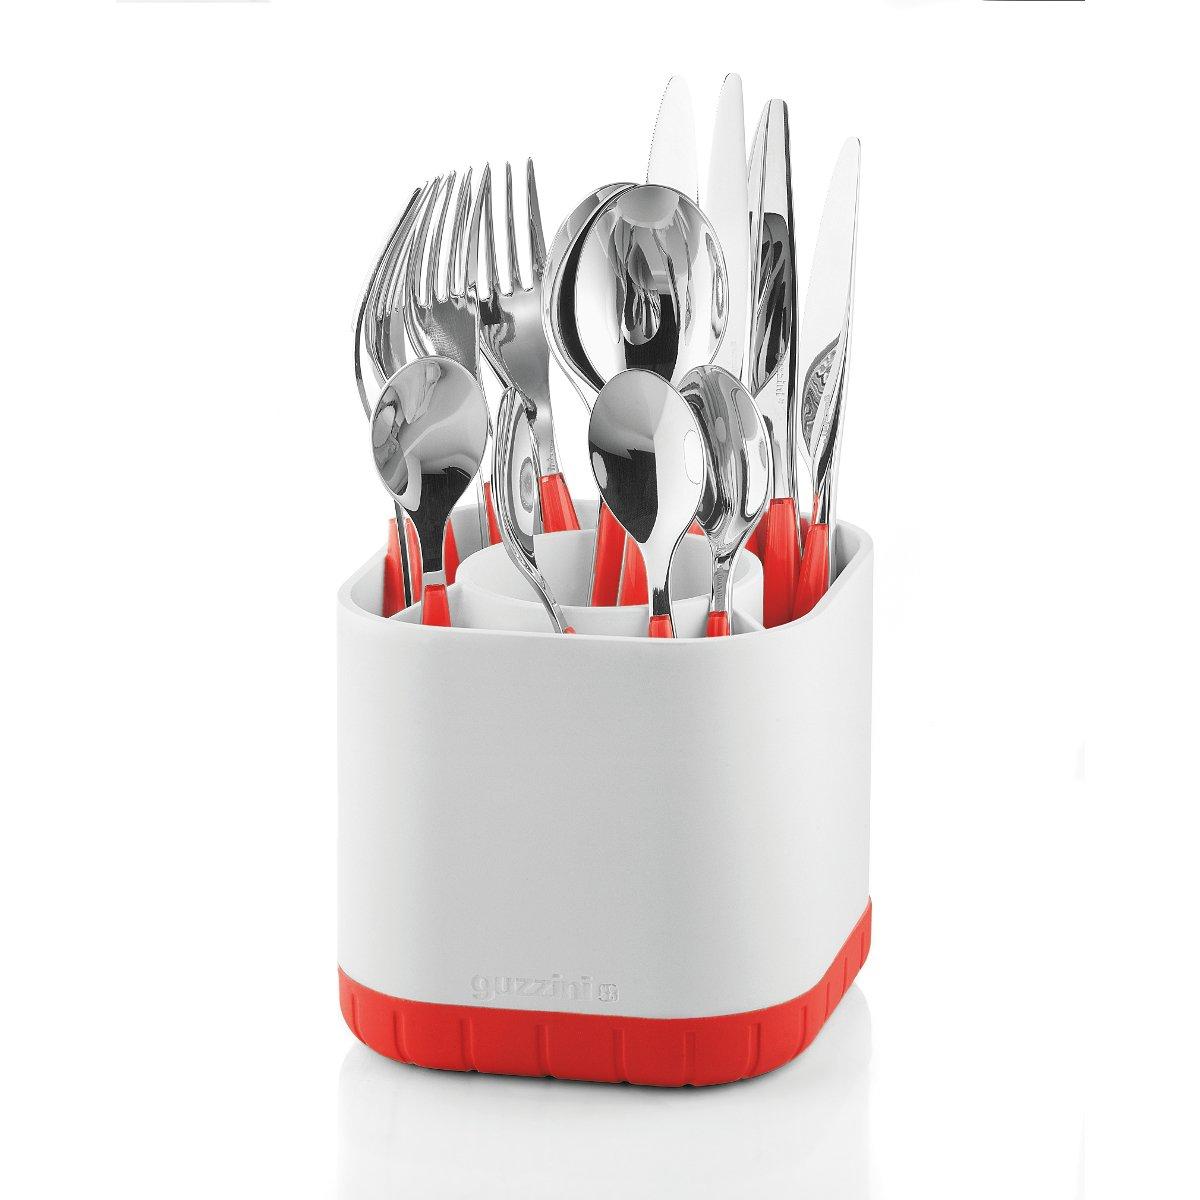 Fratelli Guzzini Kitchen Active Design Scolaposate, PP, Grigio Opaco, 13 x 13 x 12.4 cm 29010033